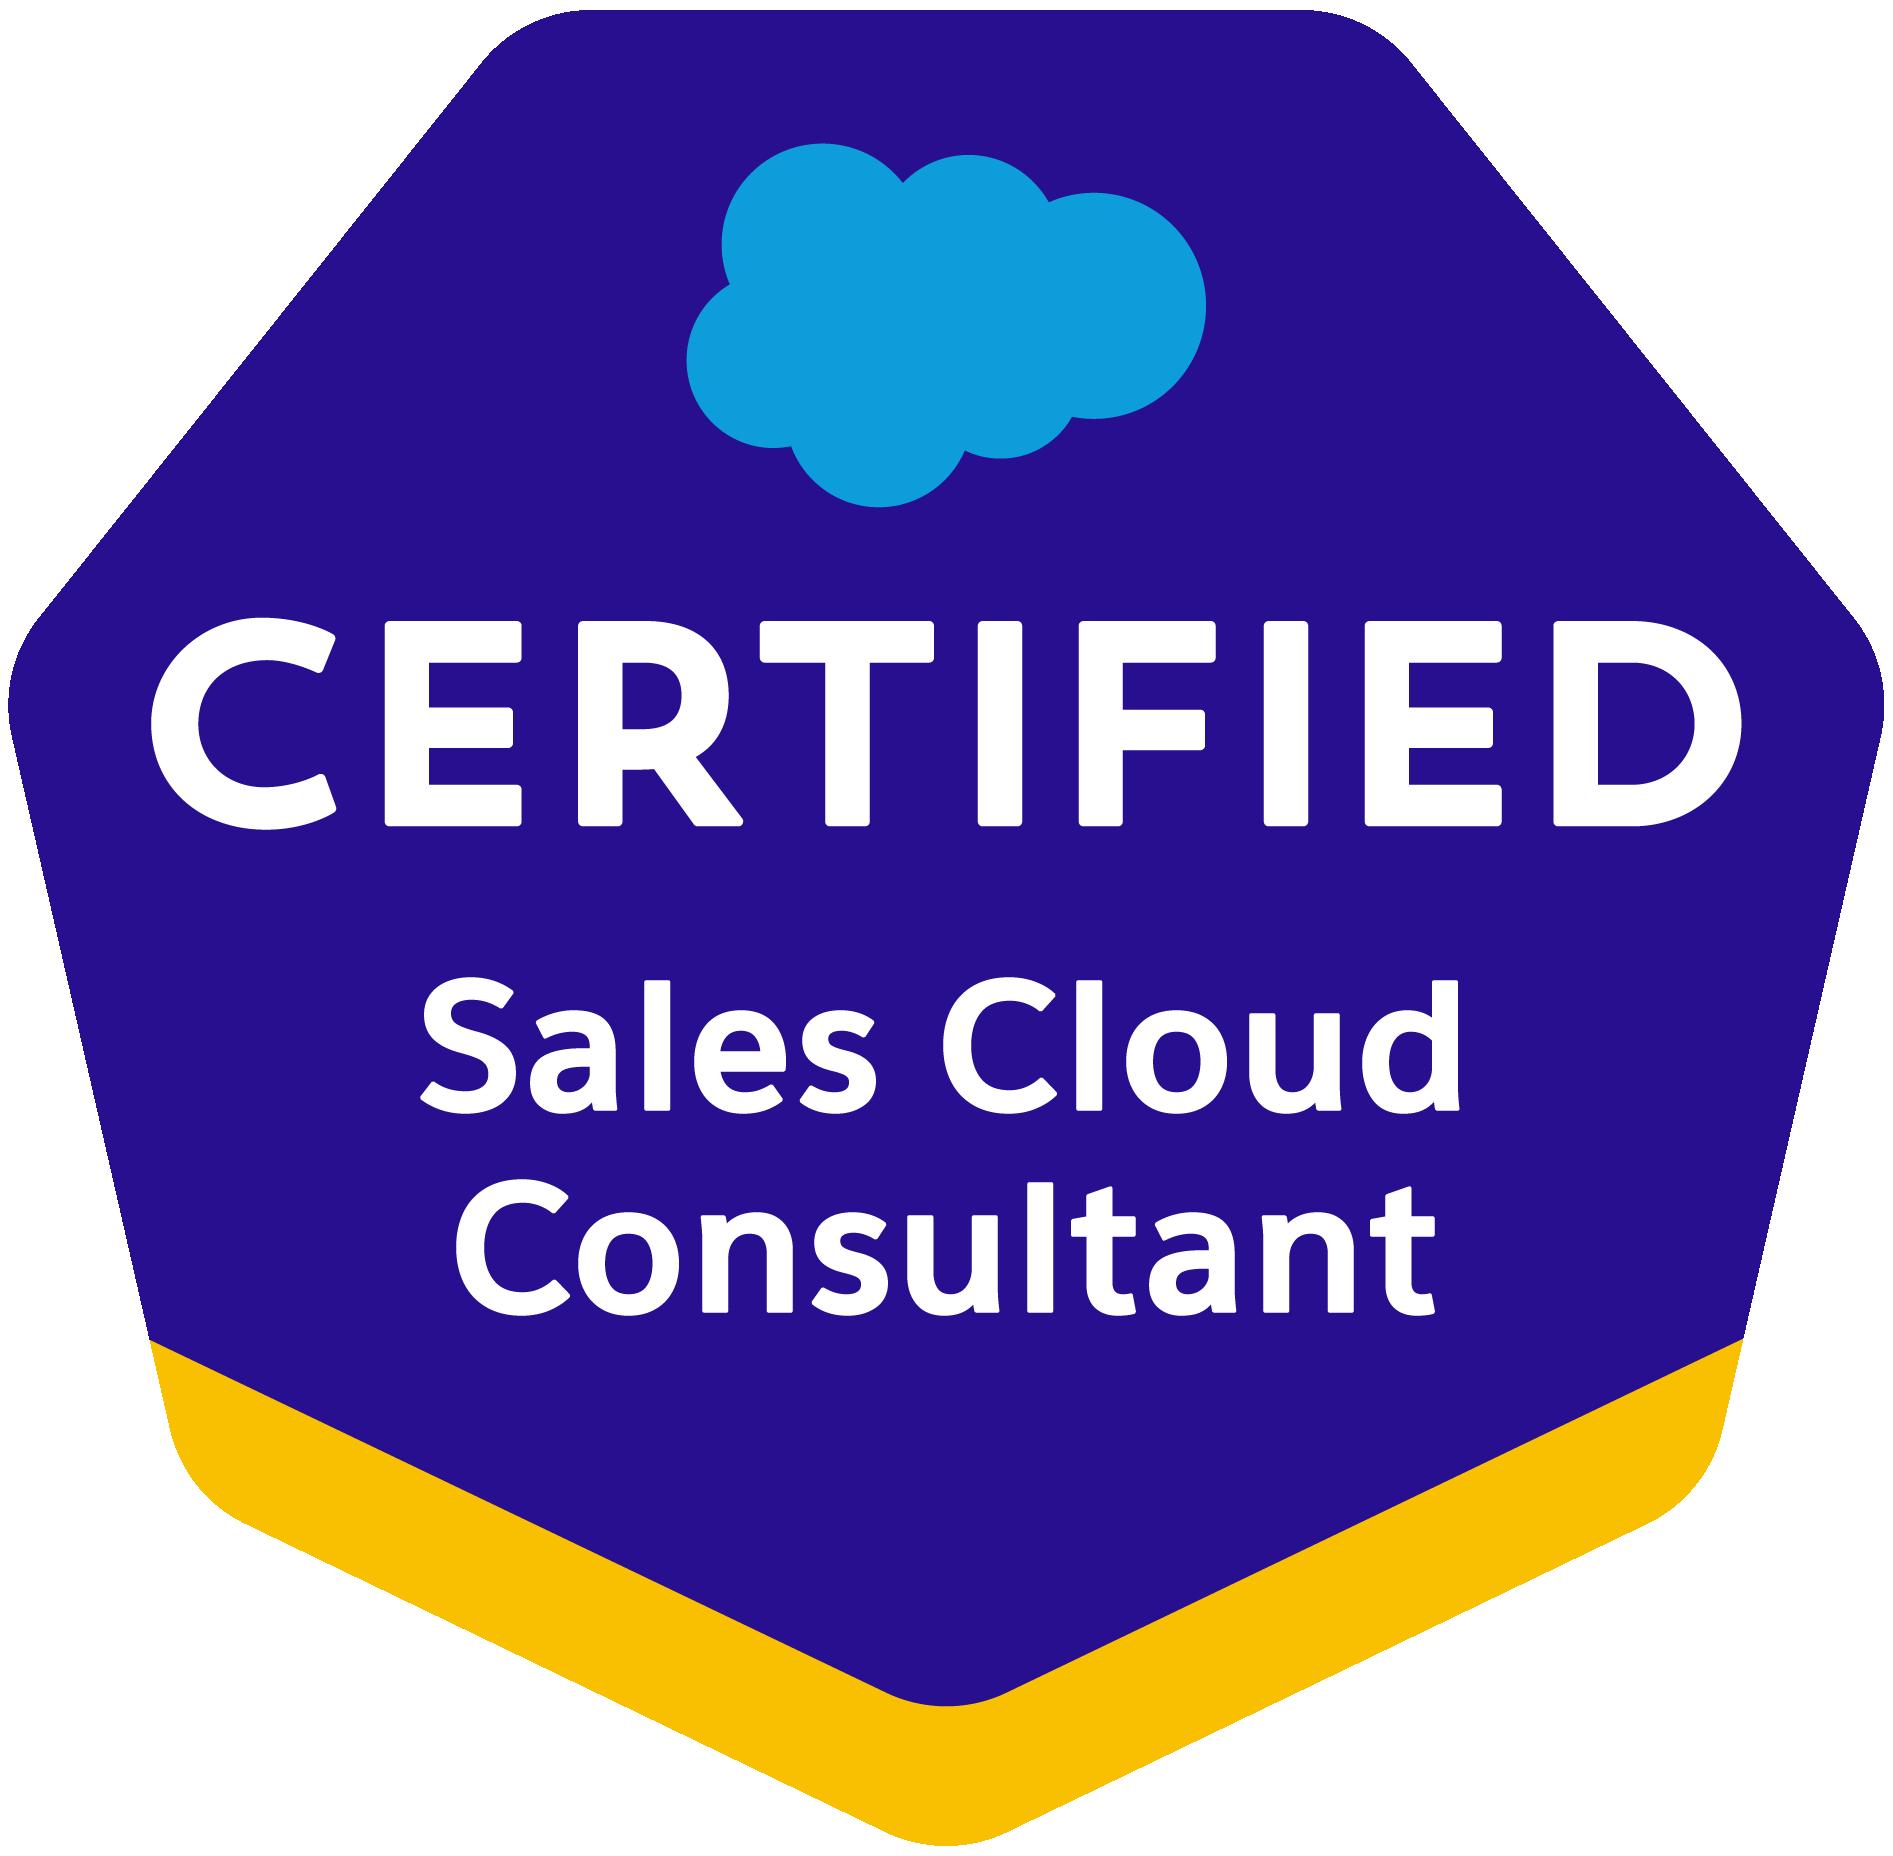 Salescloud Consultant Certification